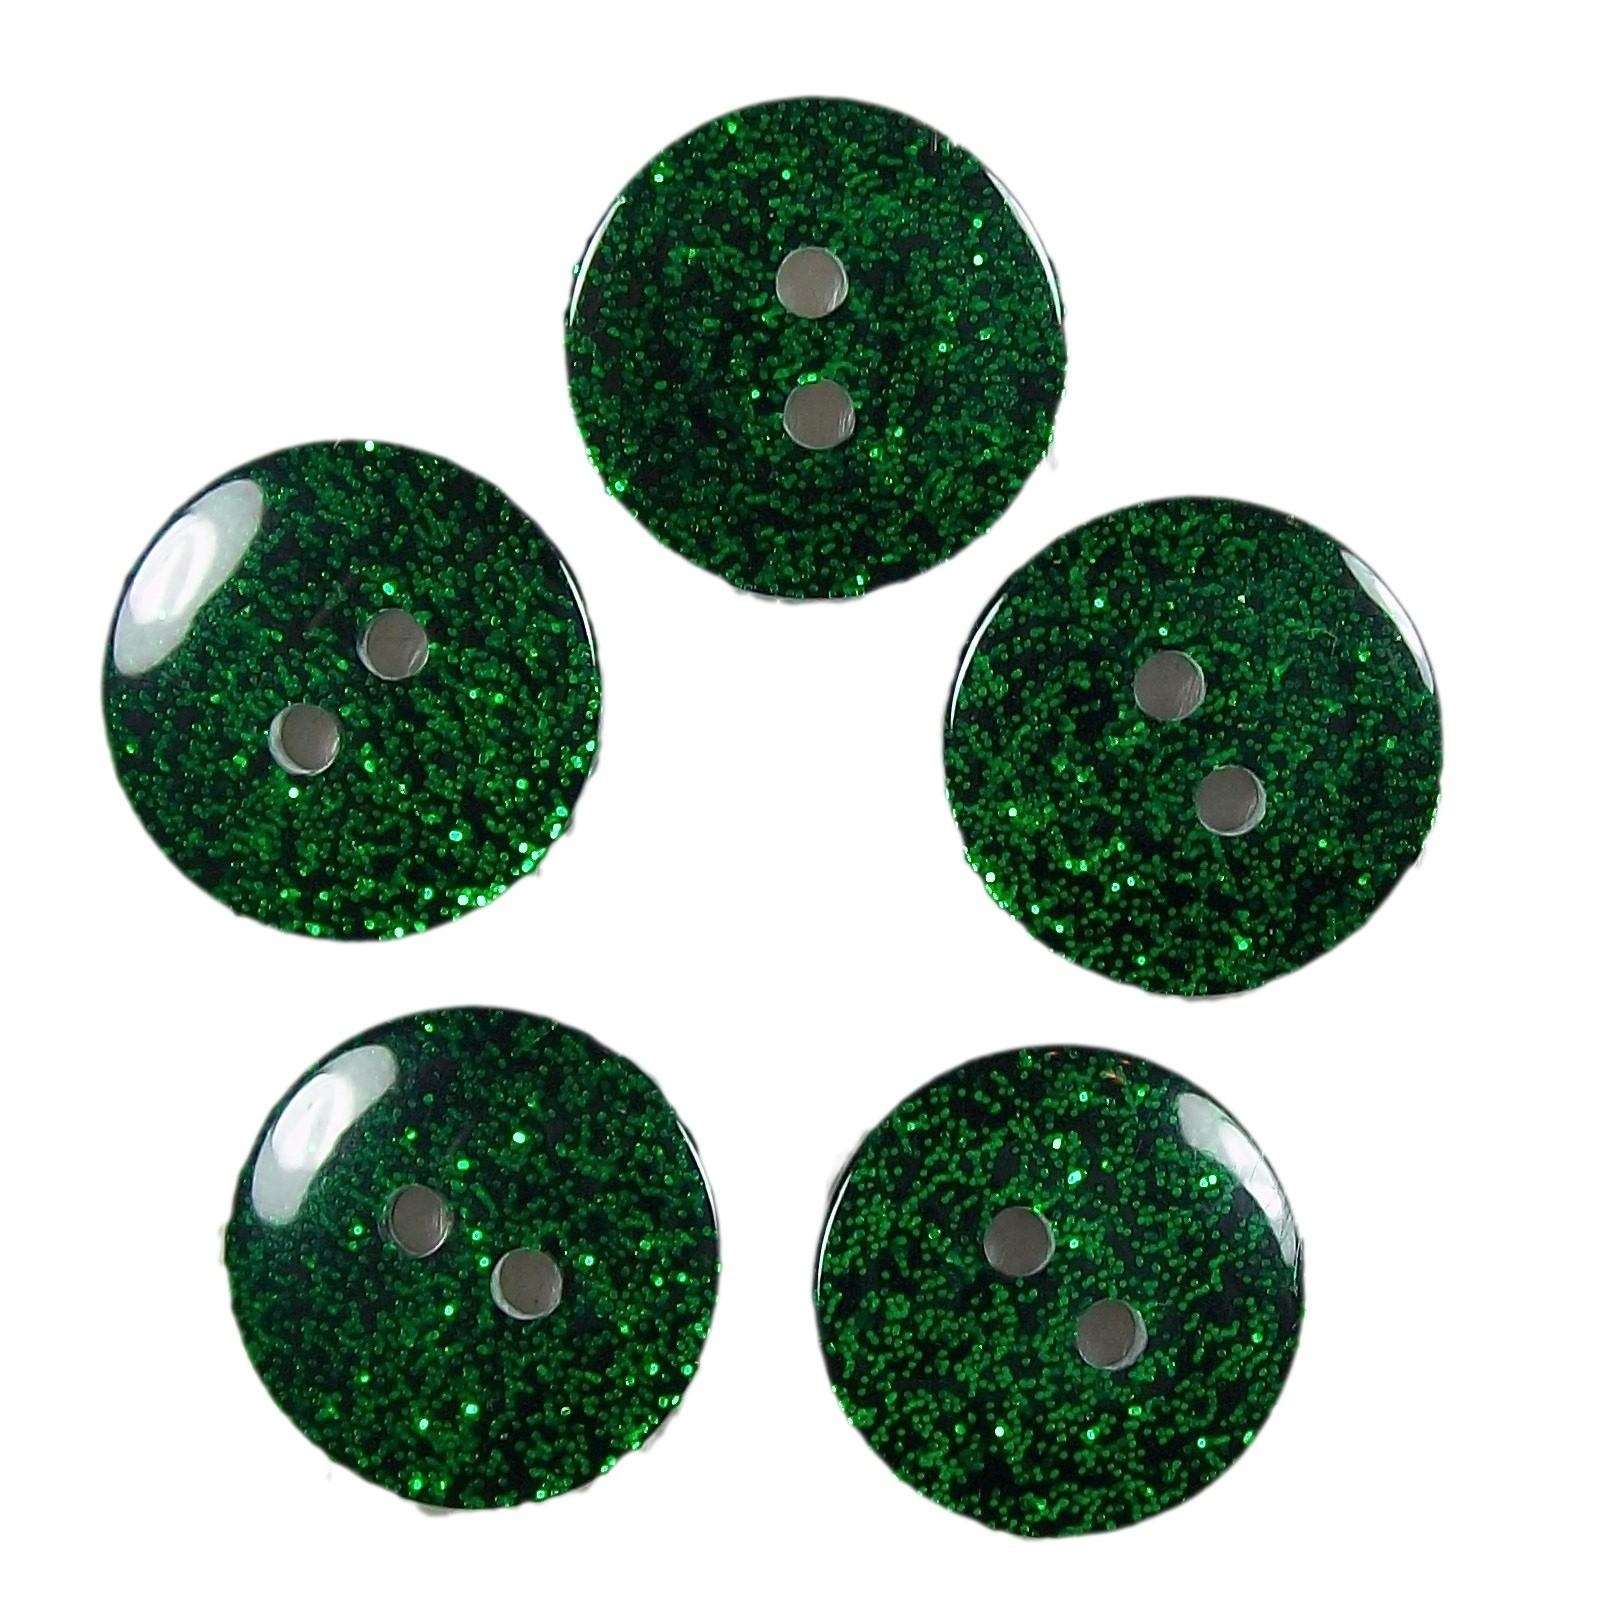 Colour Dark Glitter Buttons 17mm Green Pack of 5